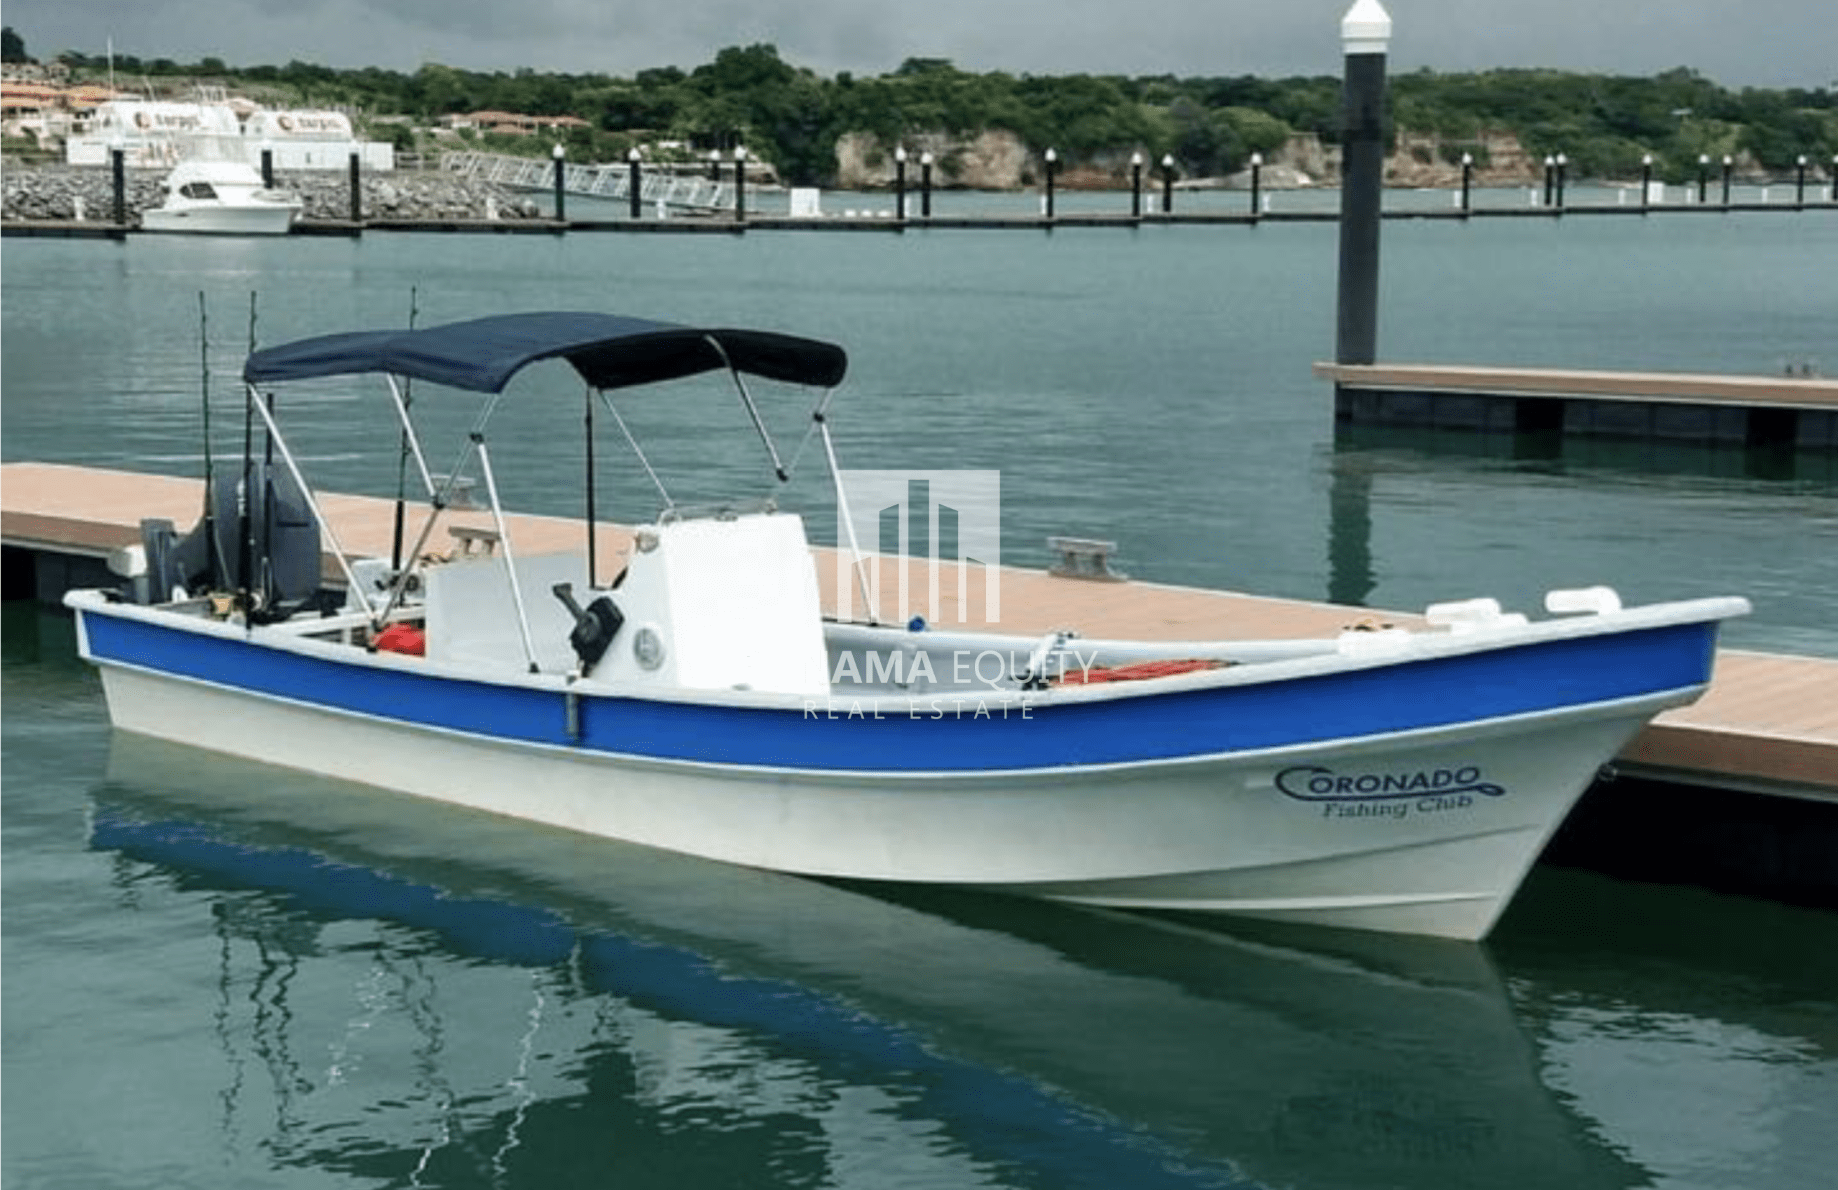 fishing-boat-docked-coronado-panama